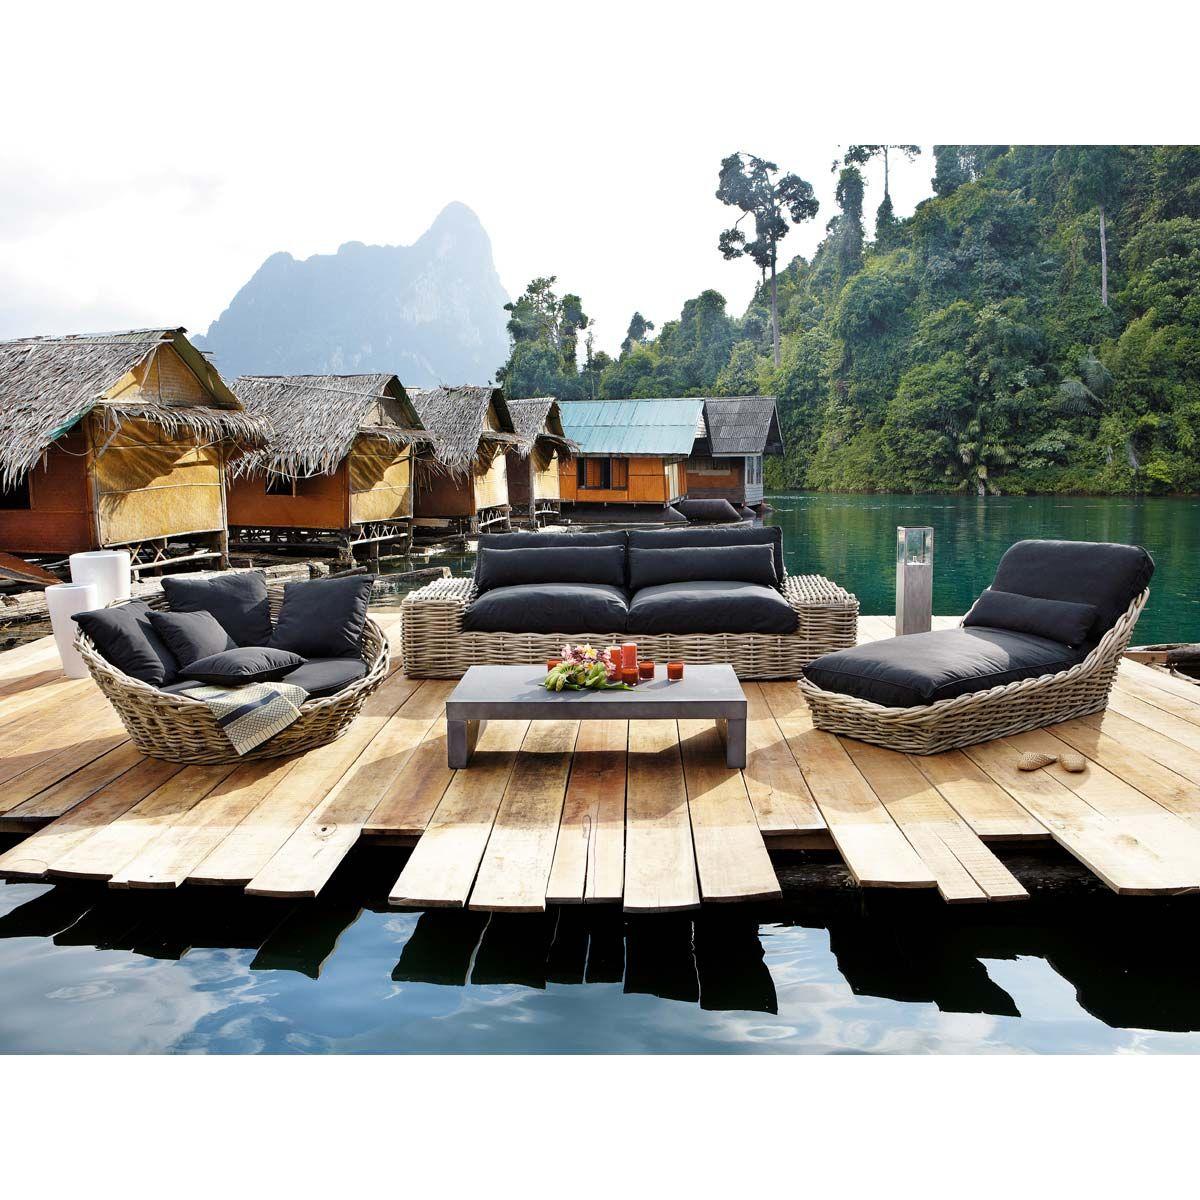 Outdoor Furniture In 2020 | Outdoor Furniture Sets, Outdoor ... pour Maison Du Monde Table De Jardin